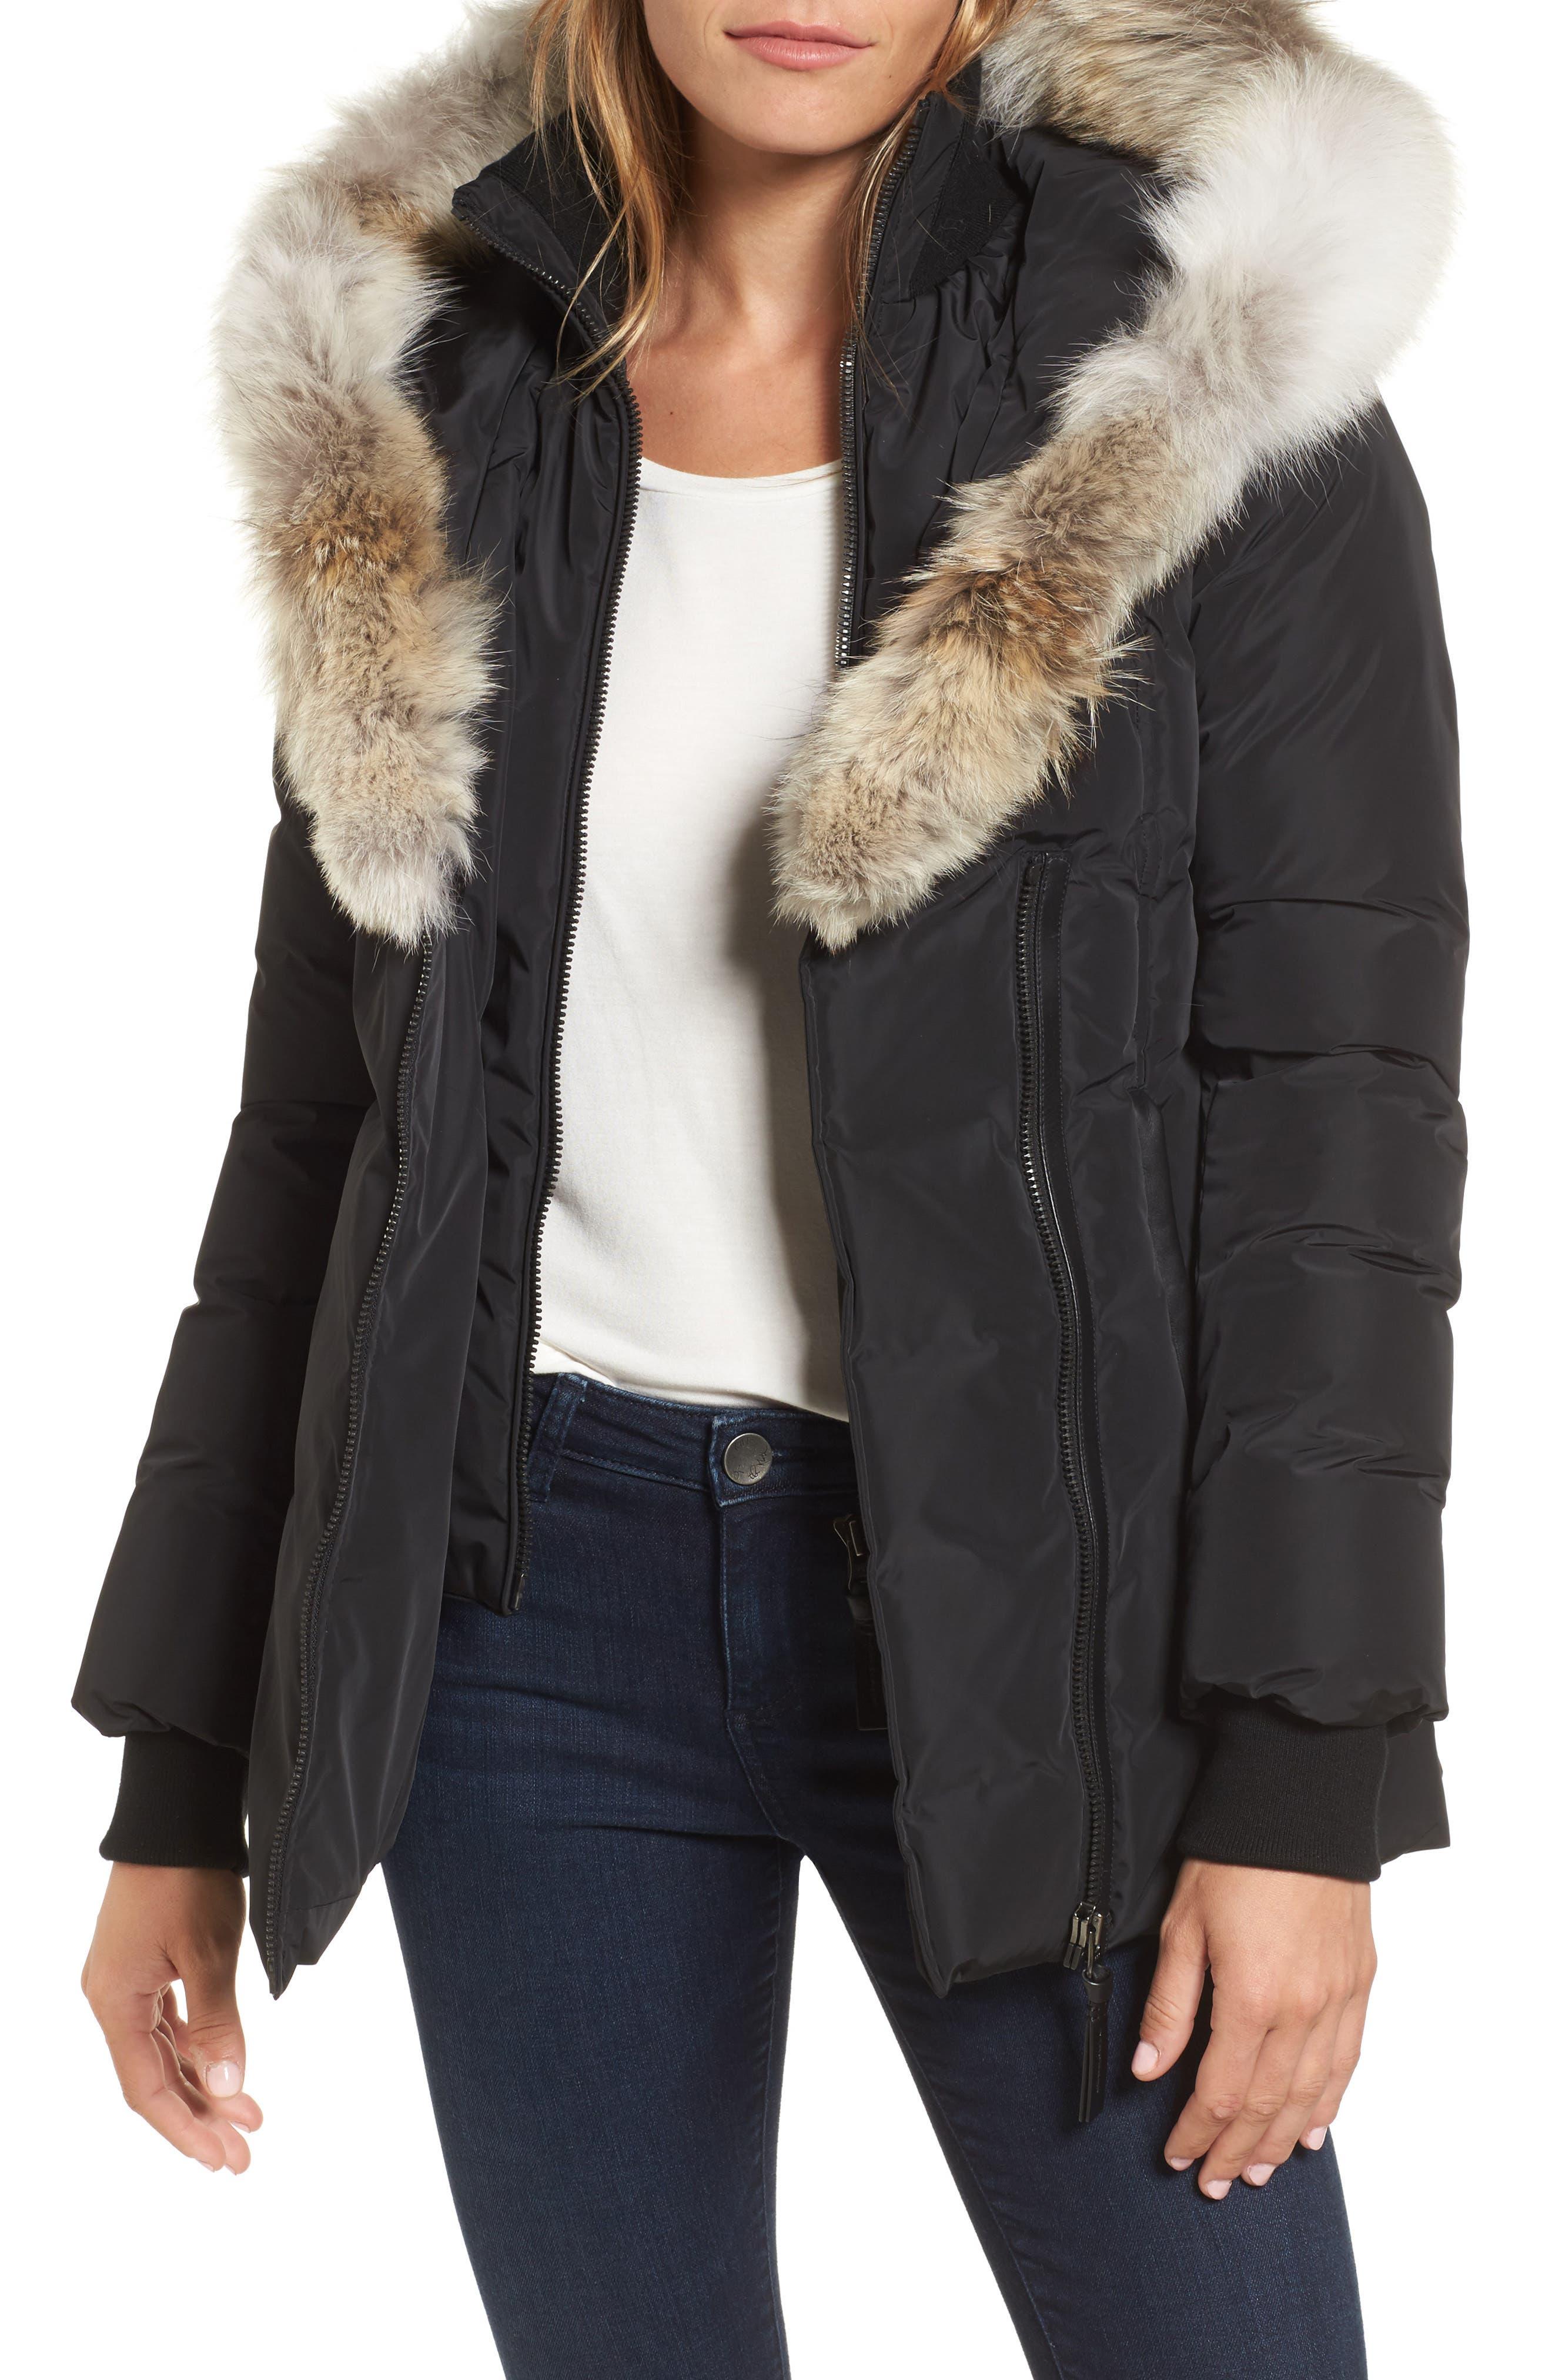 MACKAGE, Hooded Down Parka with Inset Bib & Genuine Fox Fur Trim, Main thumbnail 1, color, 001